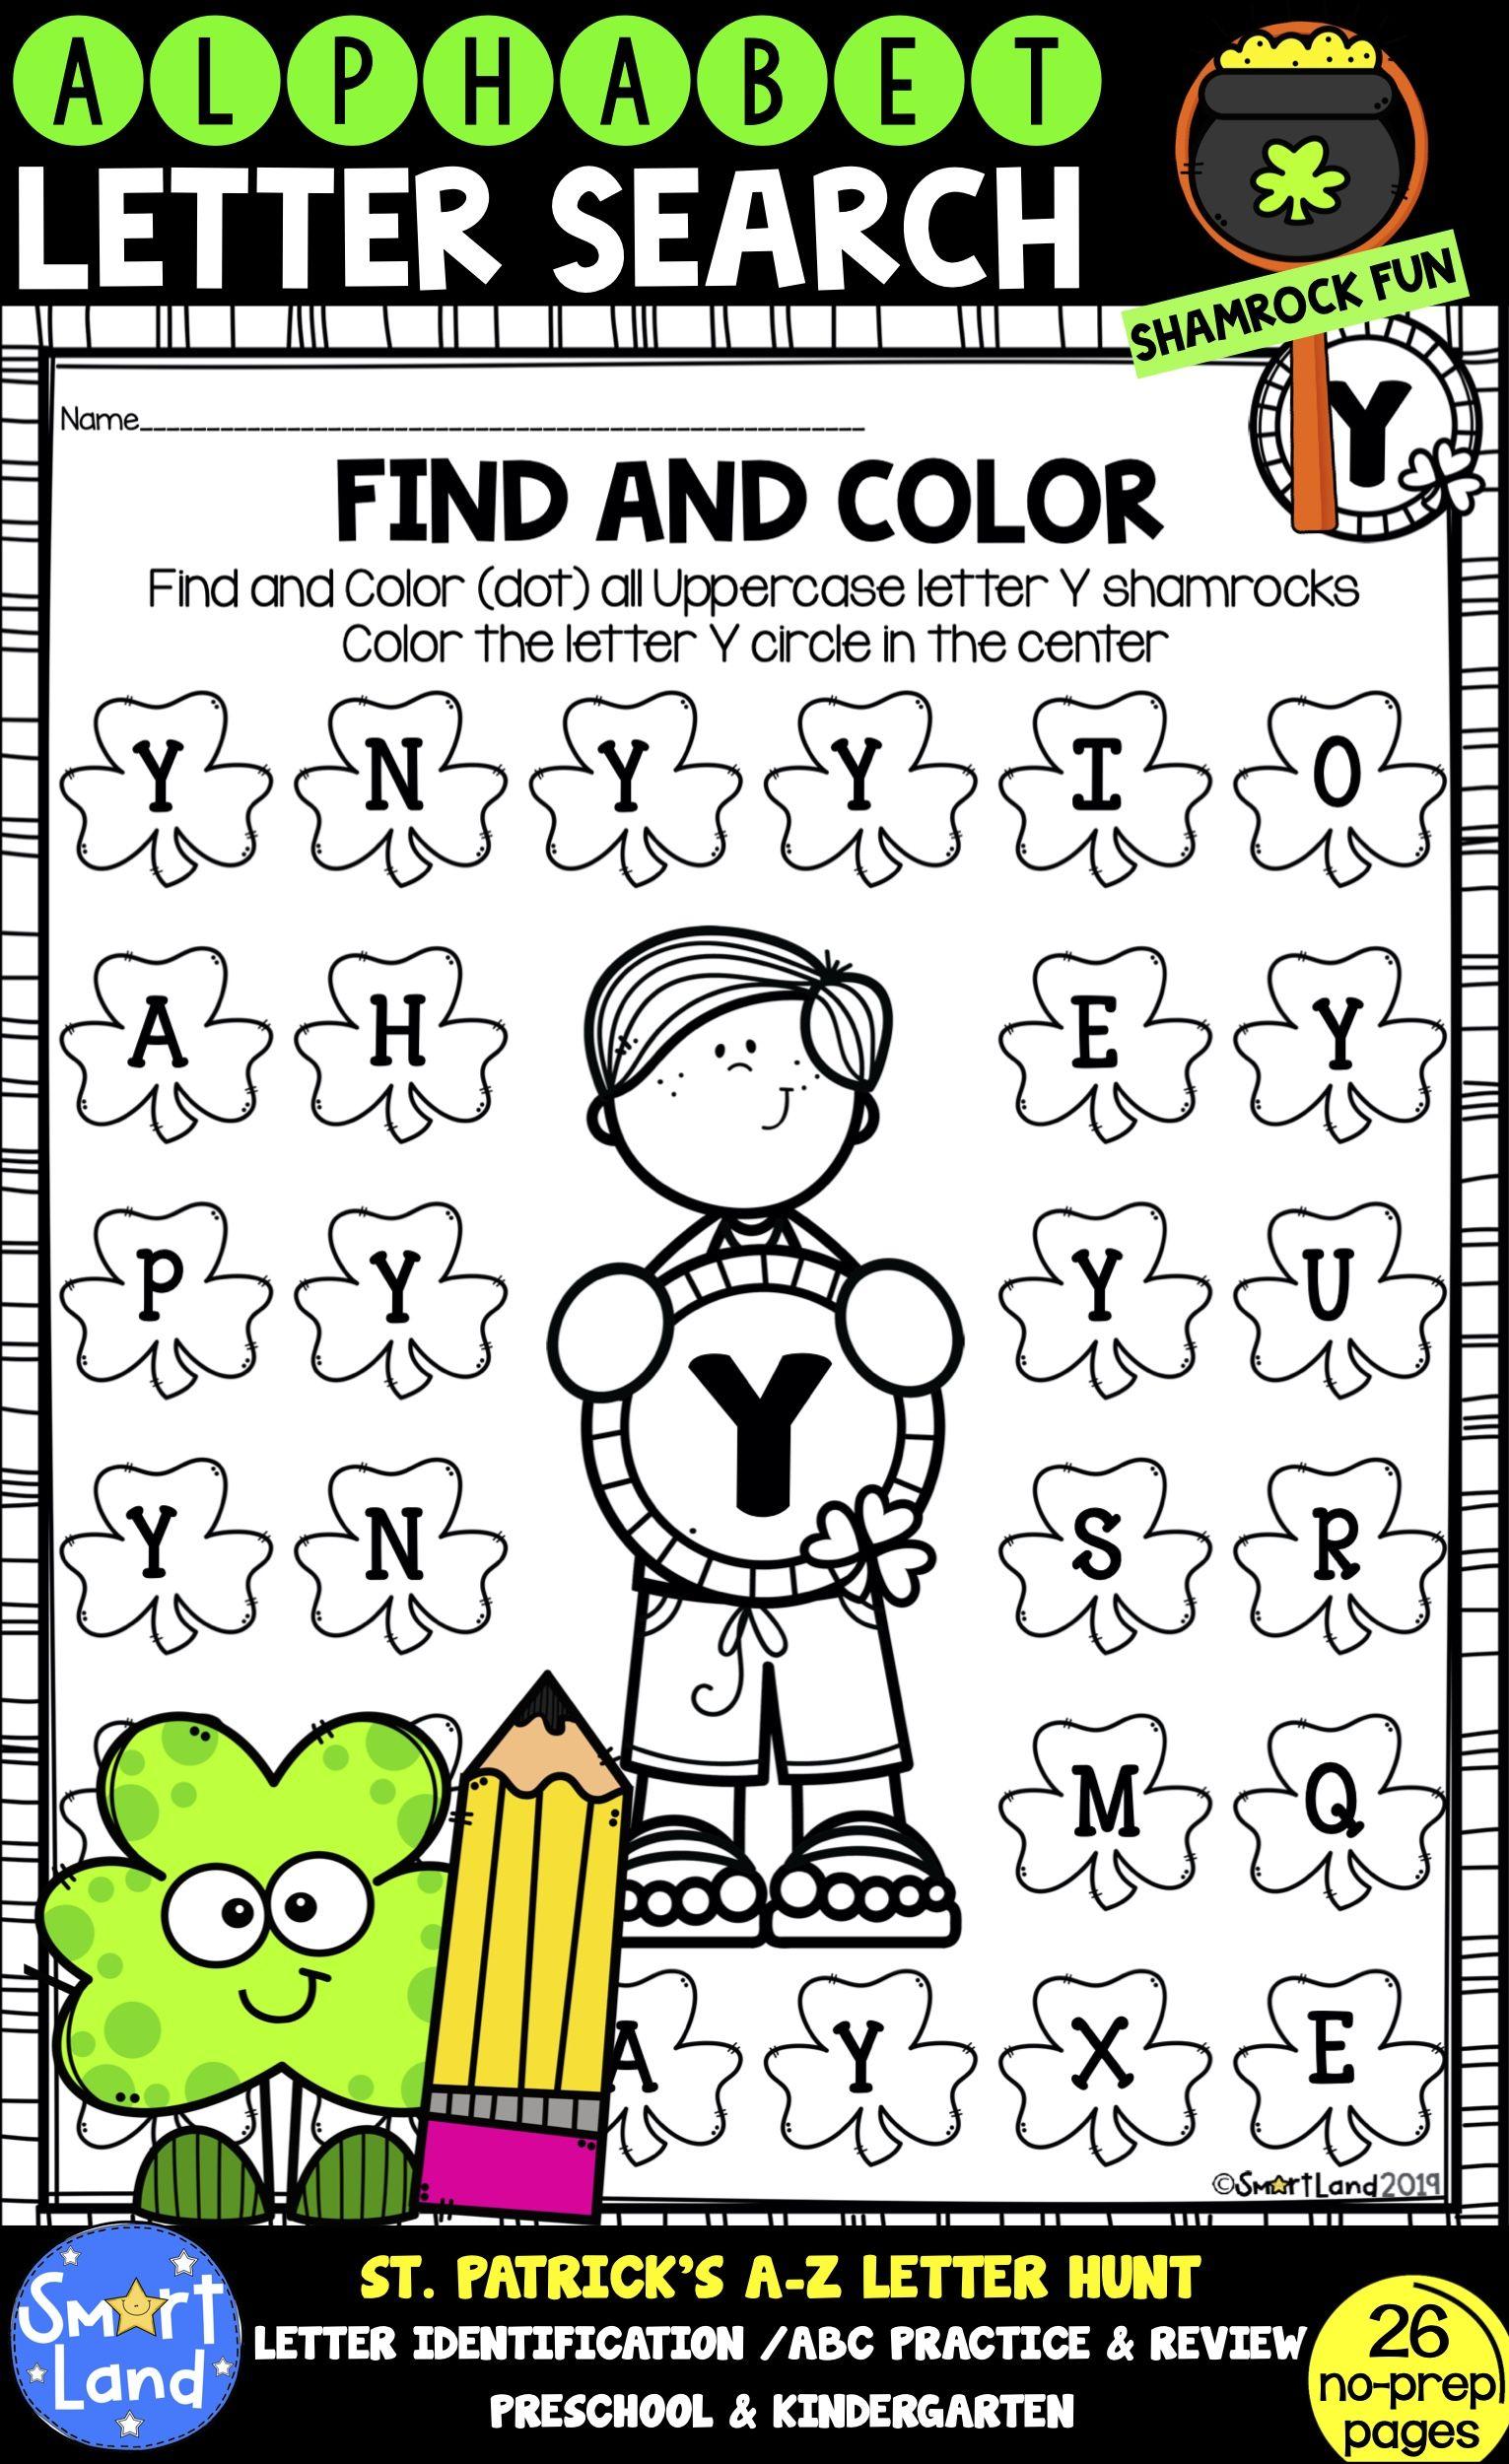 Alphabet Practice Letter Search Shamrock Fun In